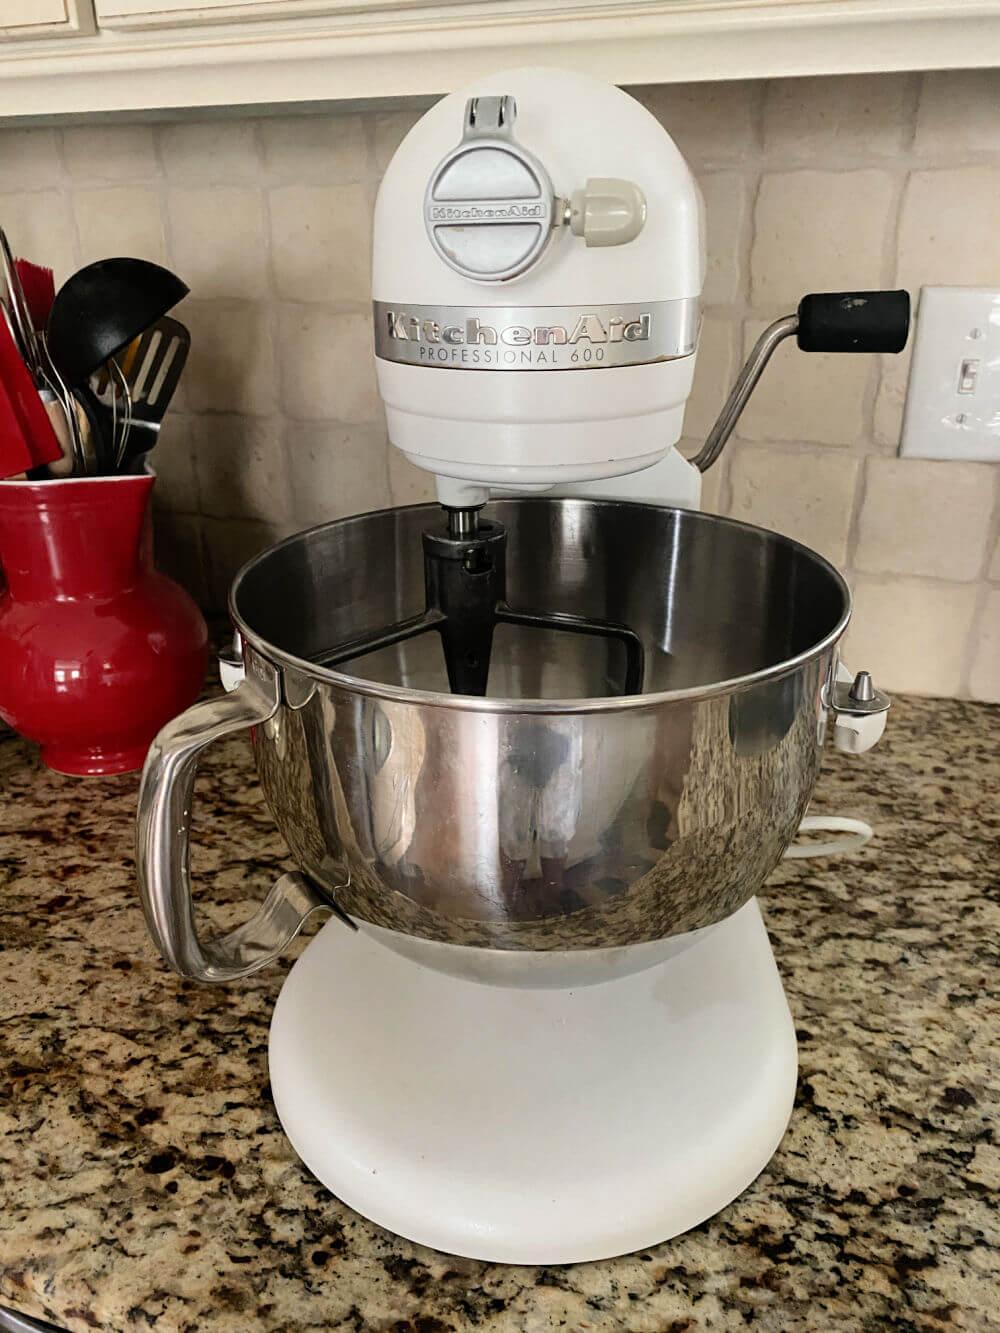 kitchen aid professional 600